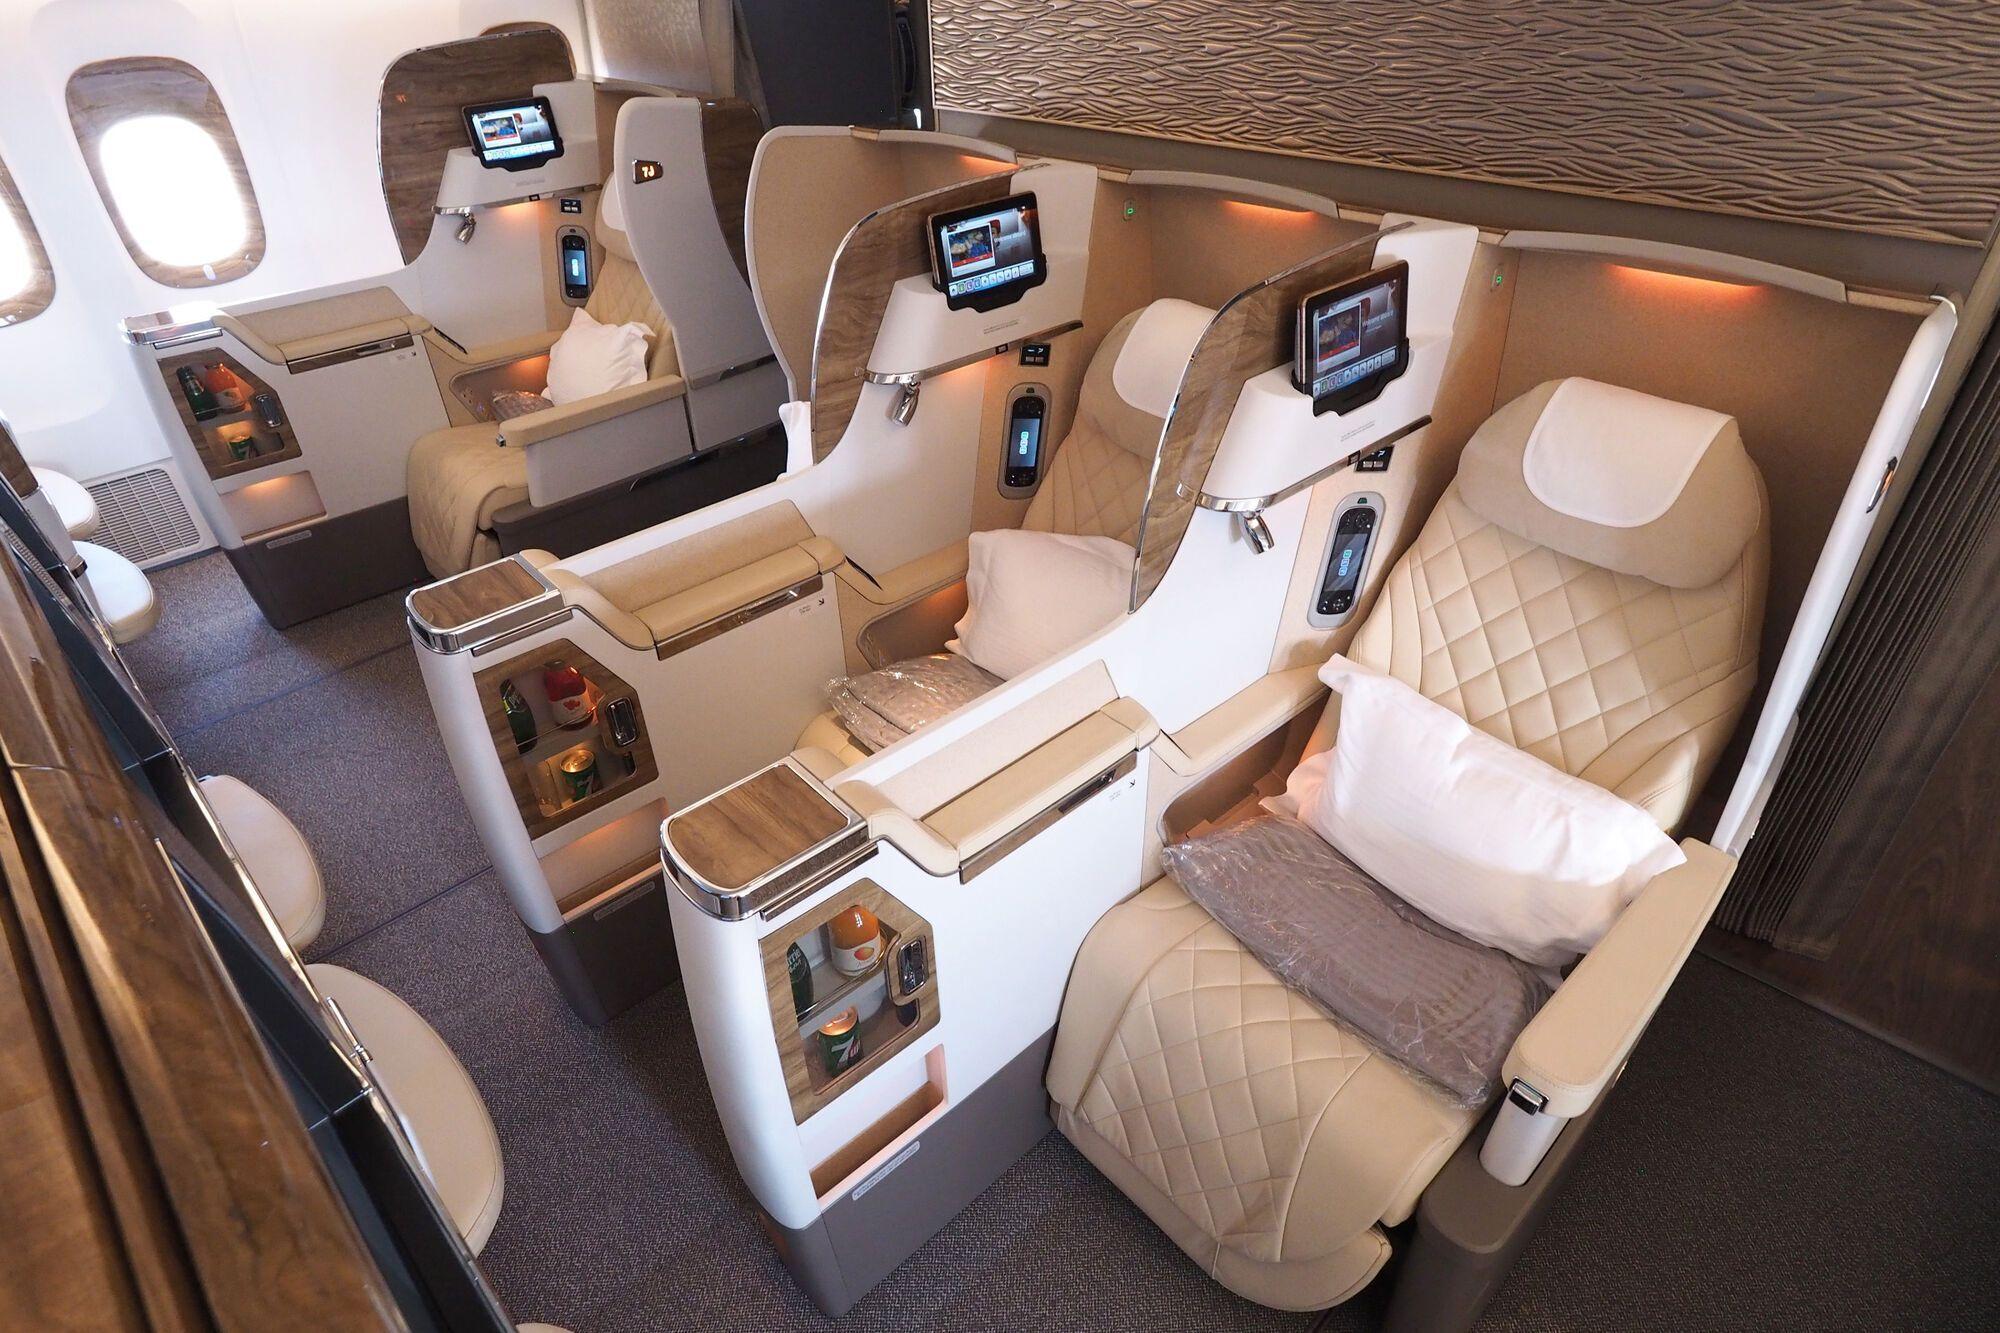 Бизнес-класс на борту самолета. travelupdate.com